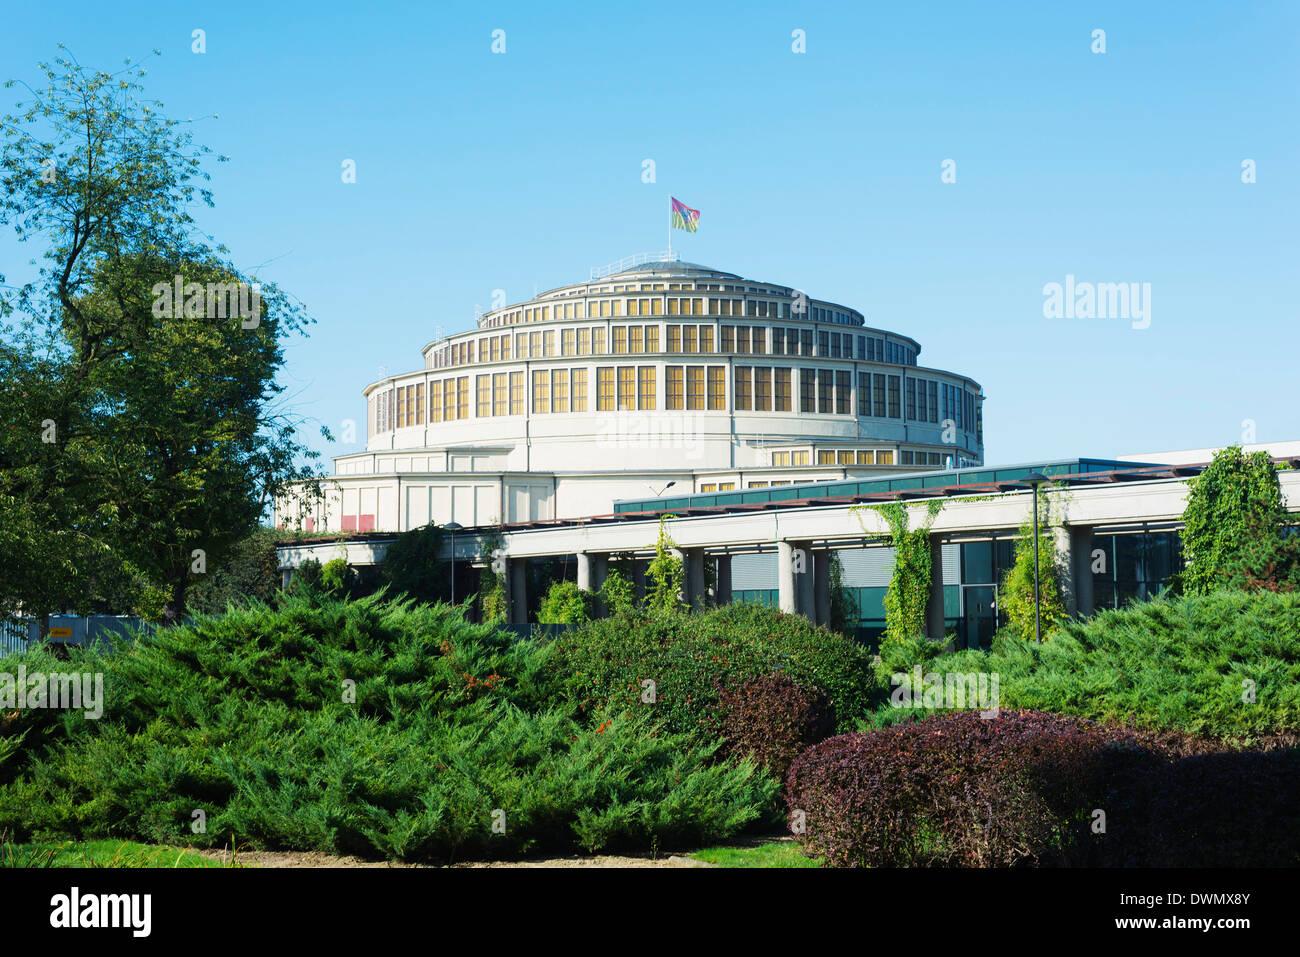 Centennial Hall, UNESCO World Heritage Site, Wroclaw, Silesia, Poland, Europe - Stock Image